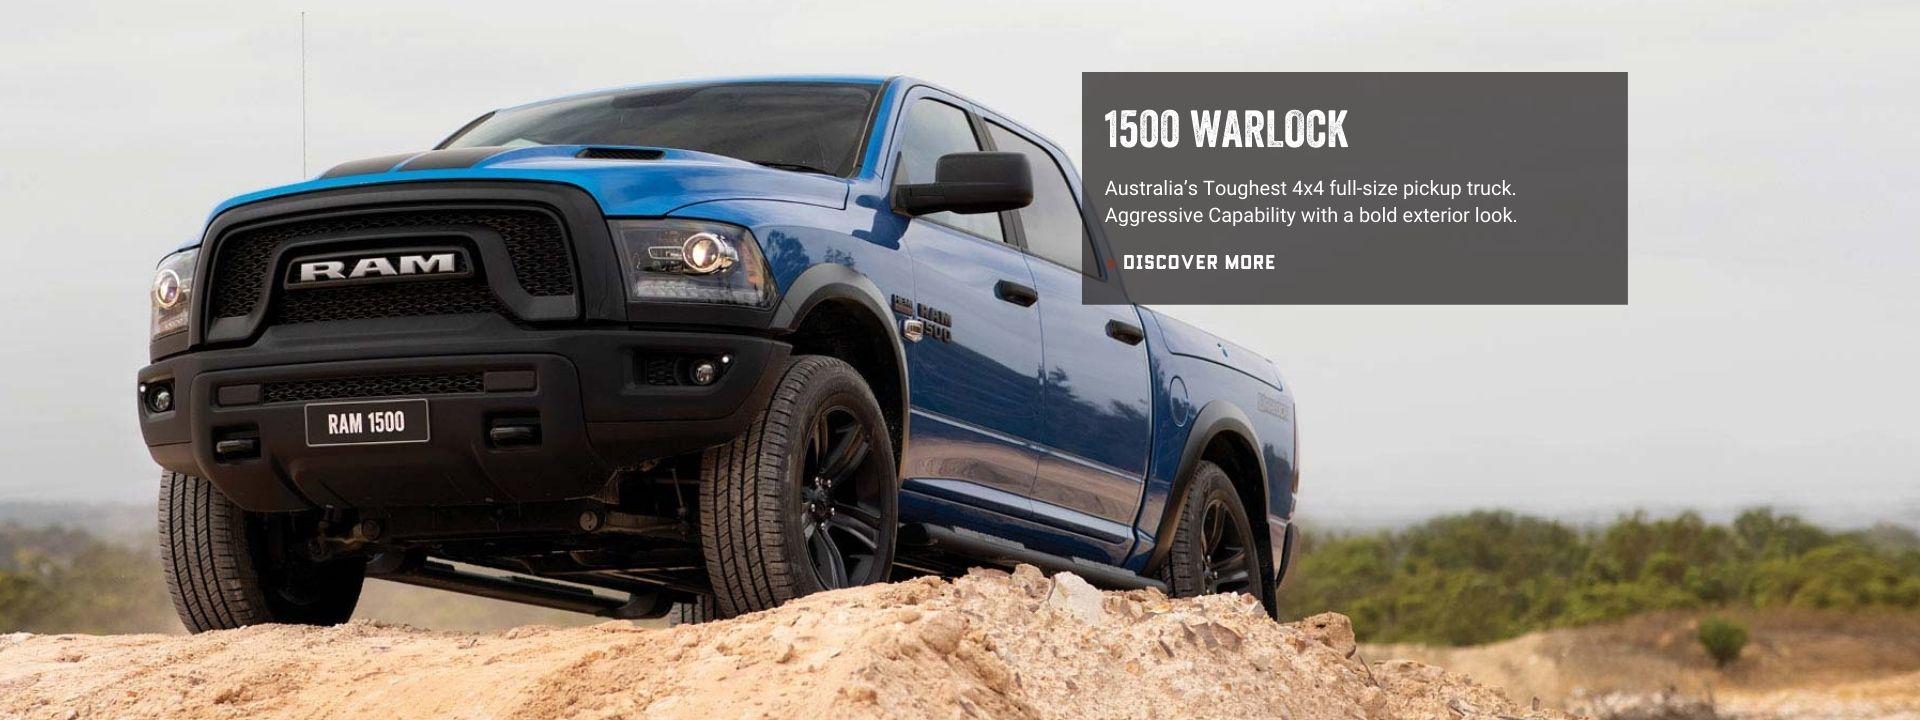 New Ram 1500 Warlock. Book a Test Drive.